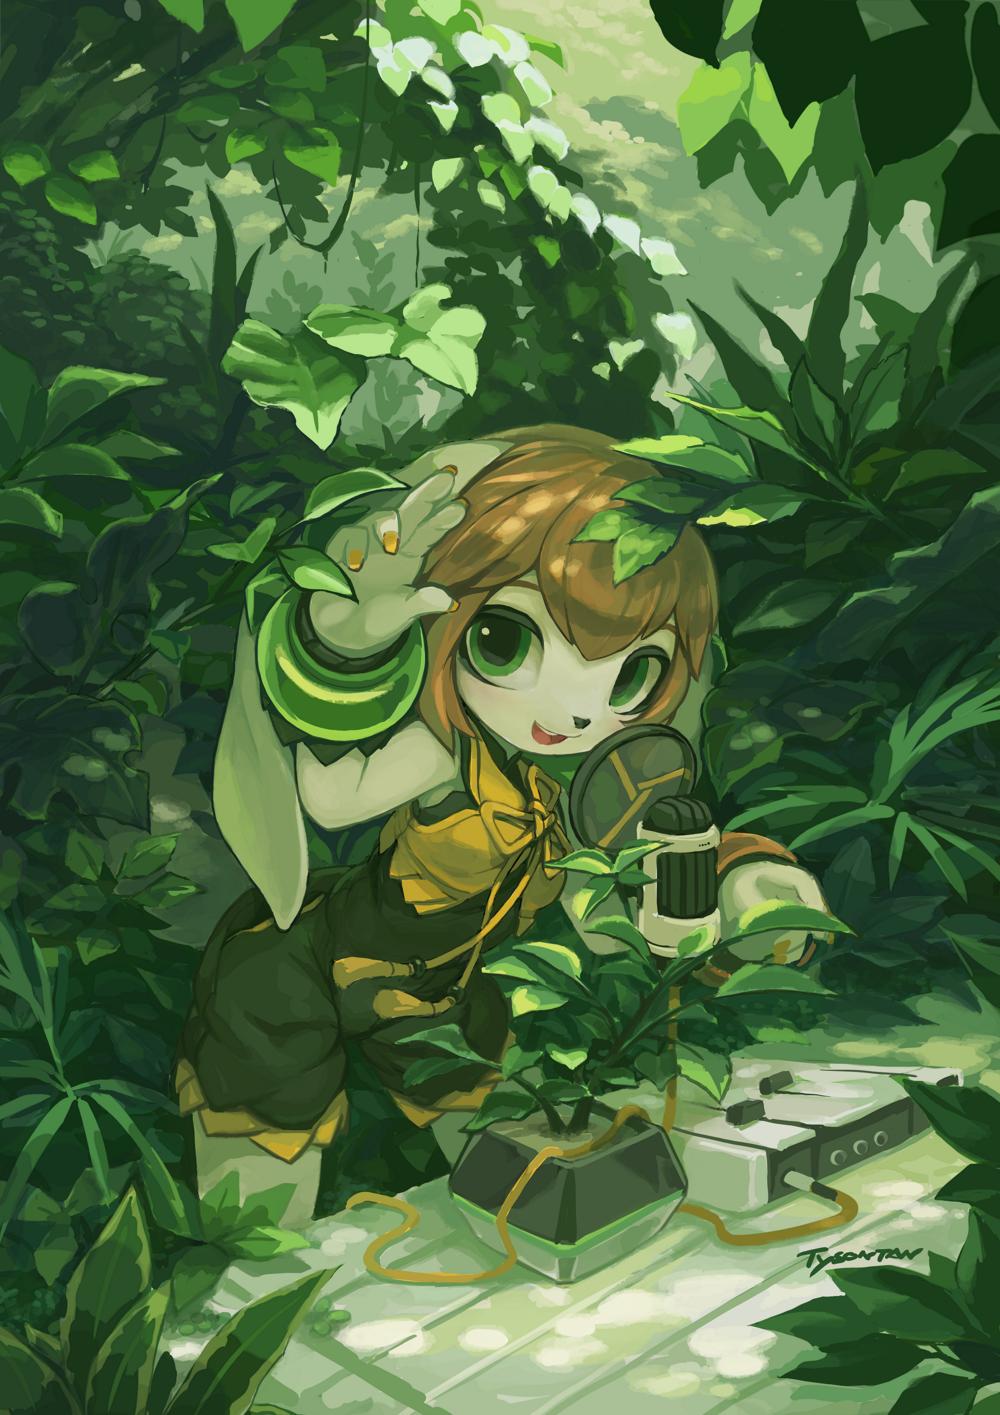 Milla's Garden Podcast by TysonTan